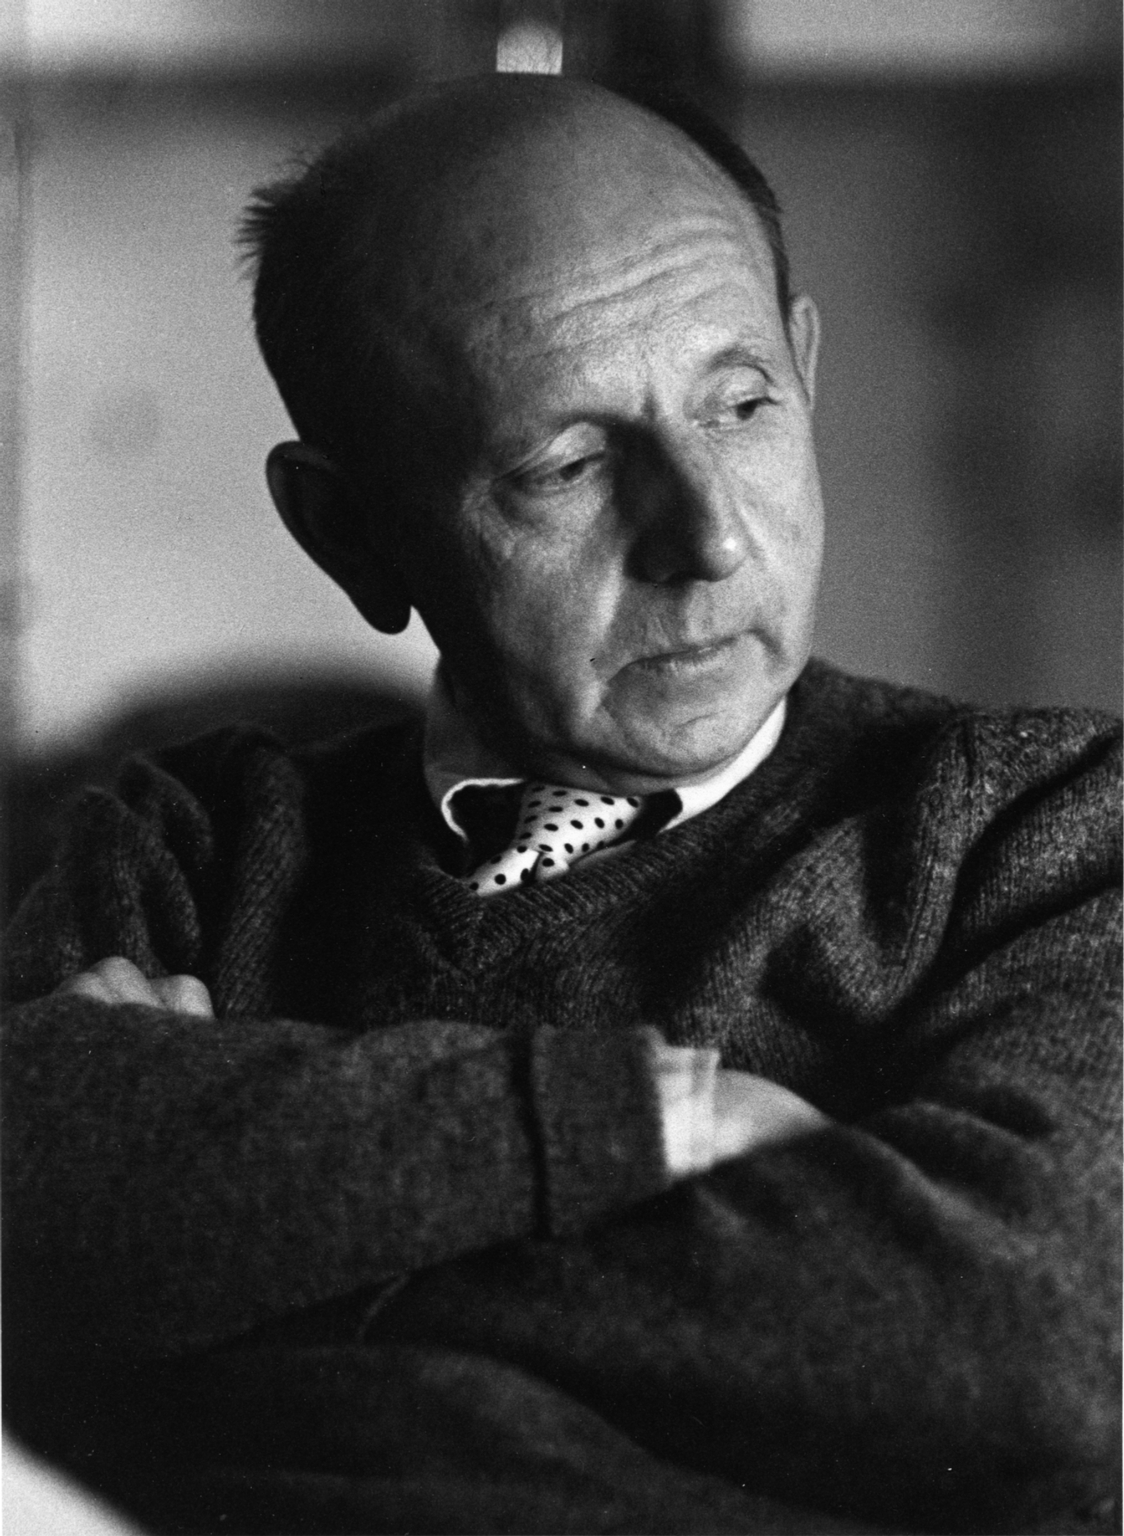 Frederick Meyer